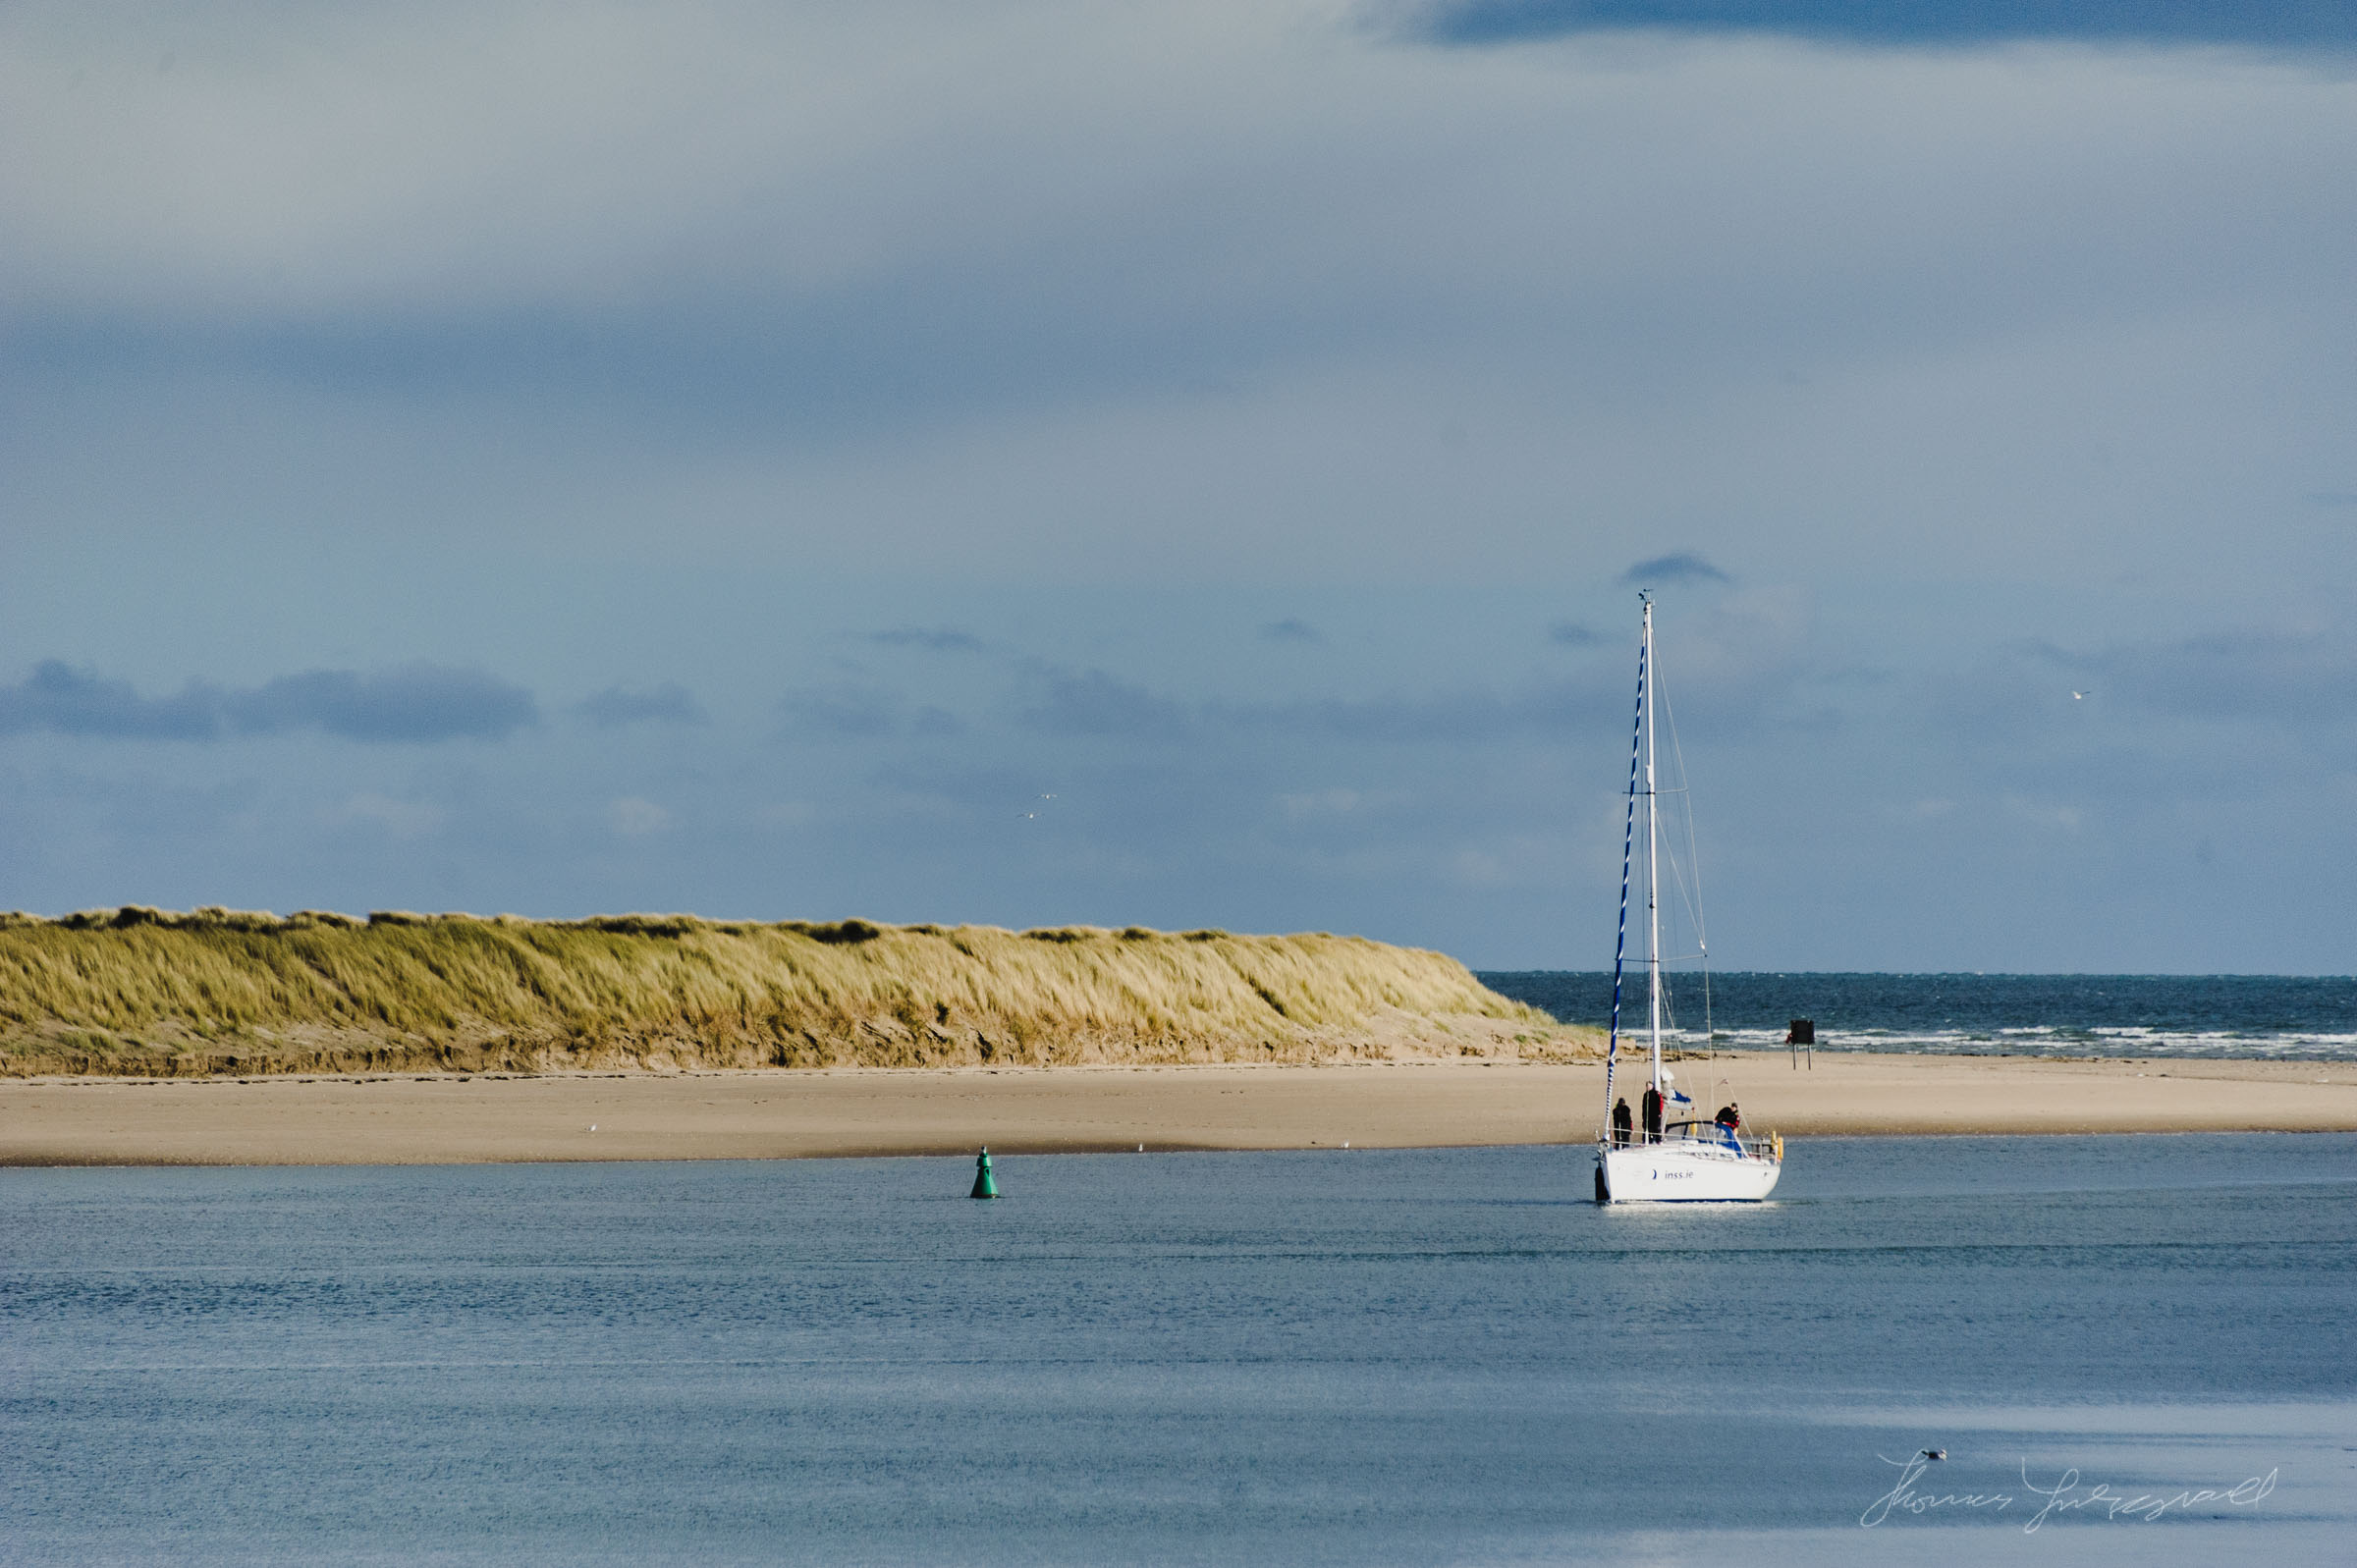 A Boat comes into the Estuary in Malahide